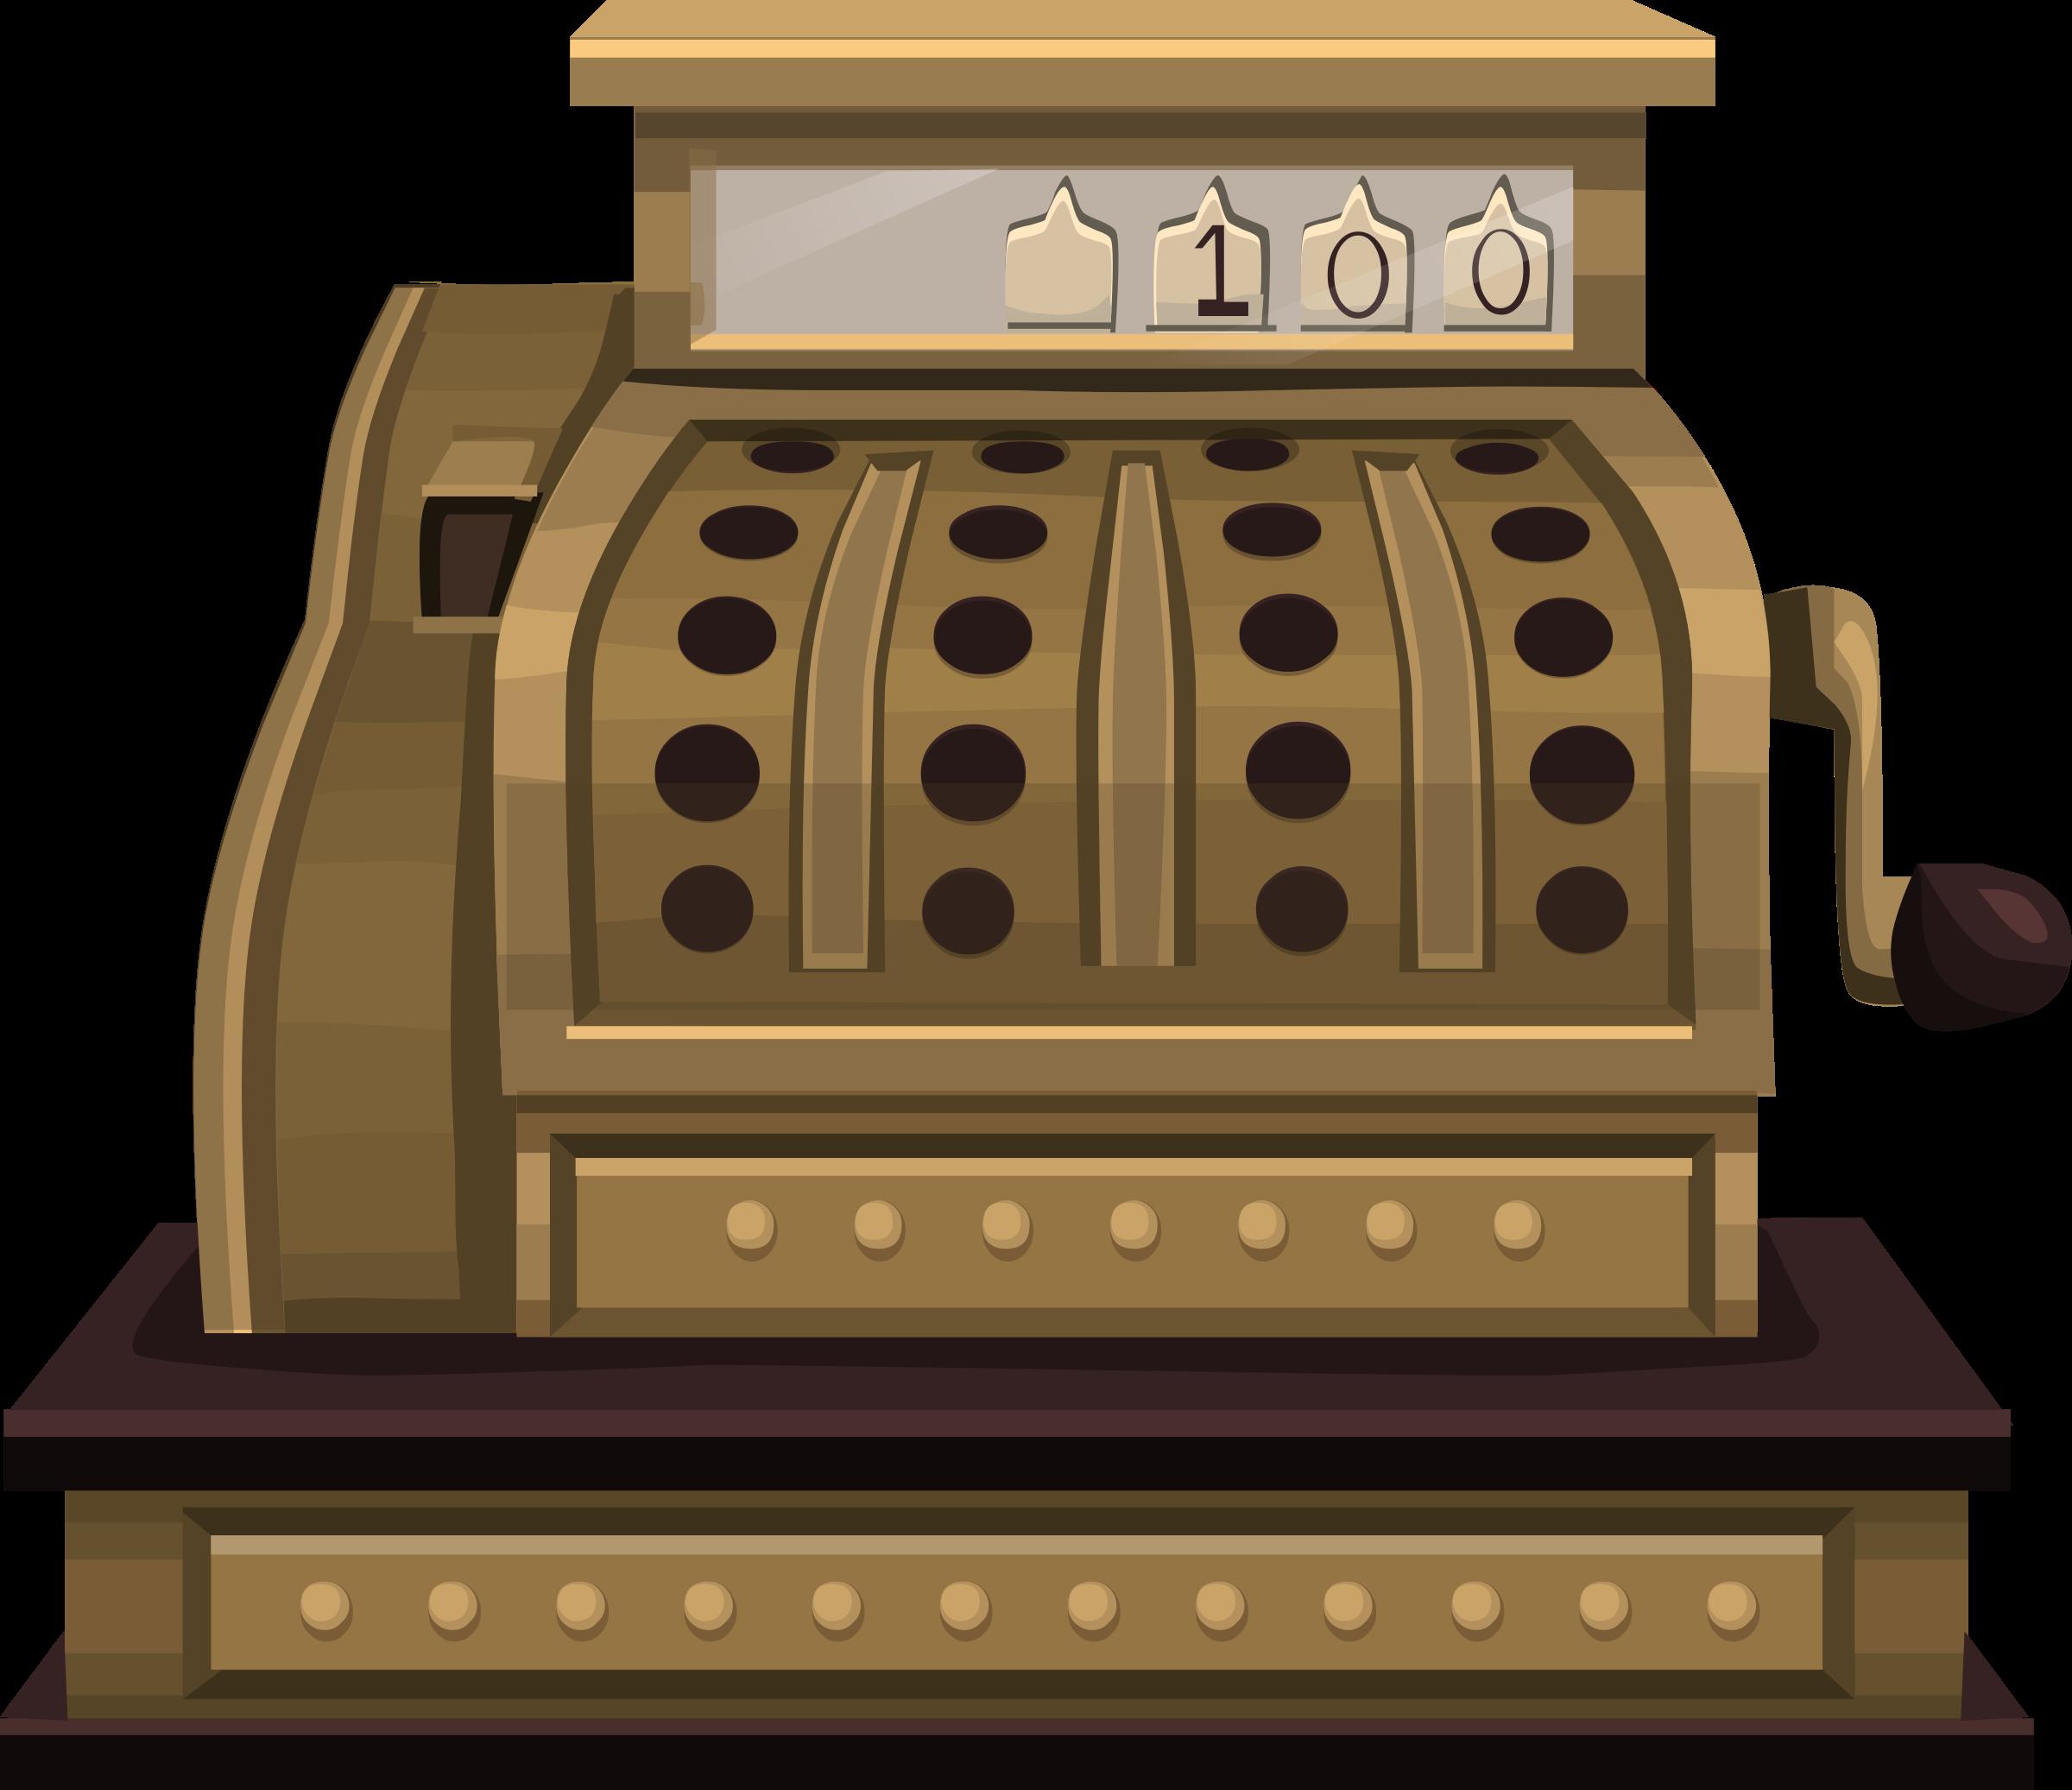 Steampunk clipart architecture. Cash register from glitch